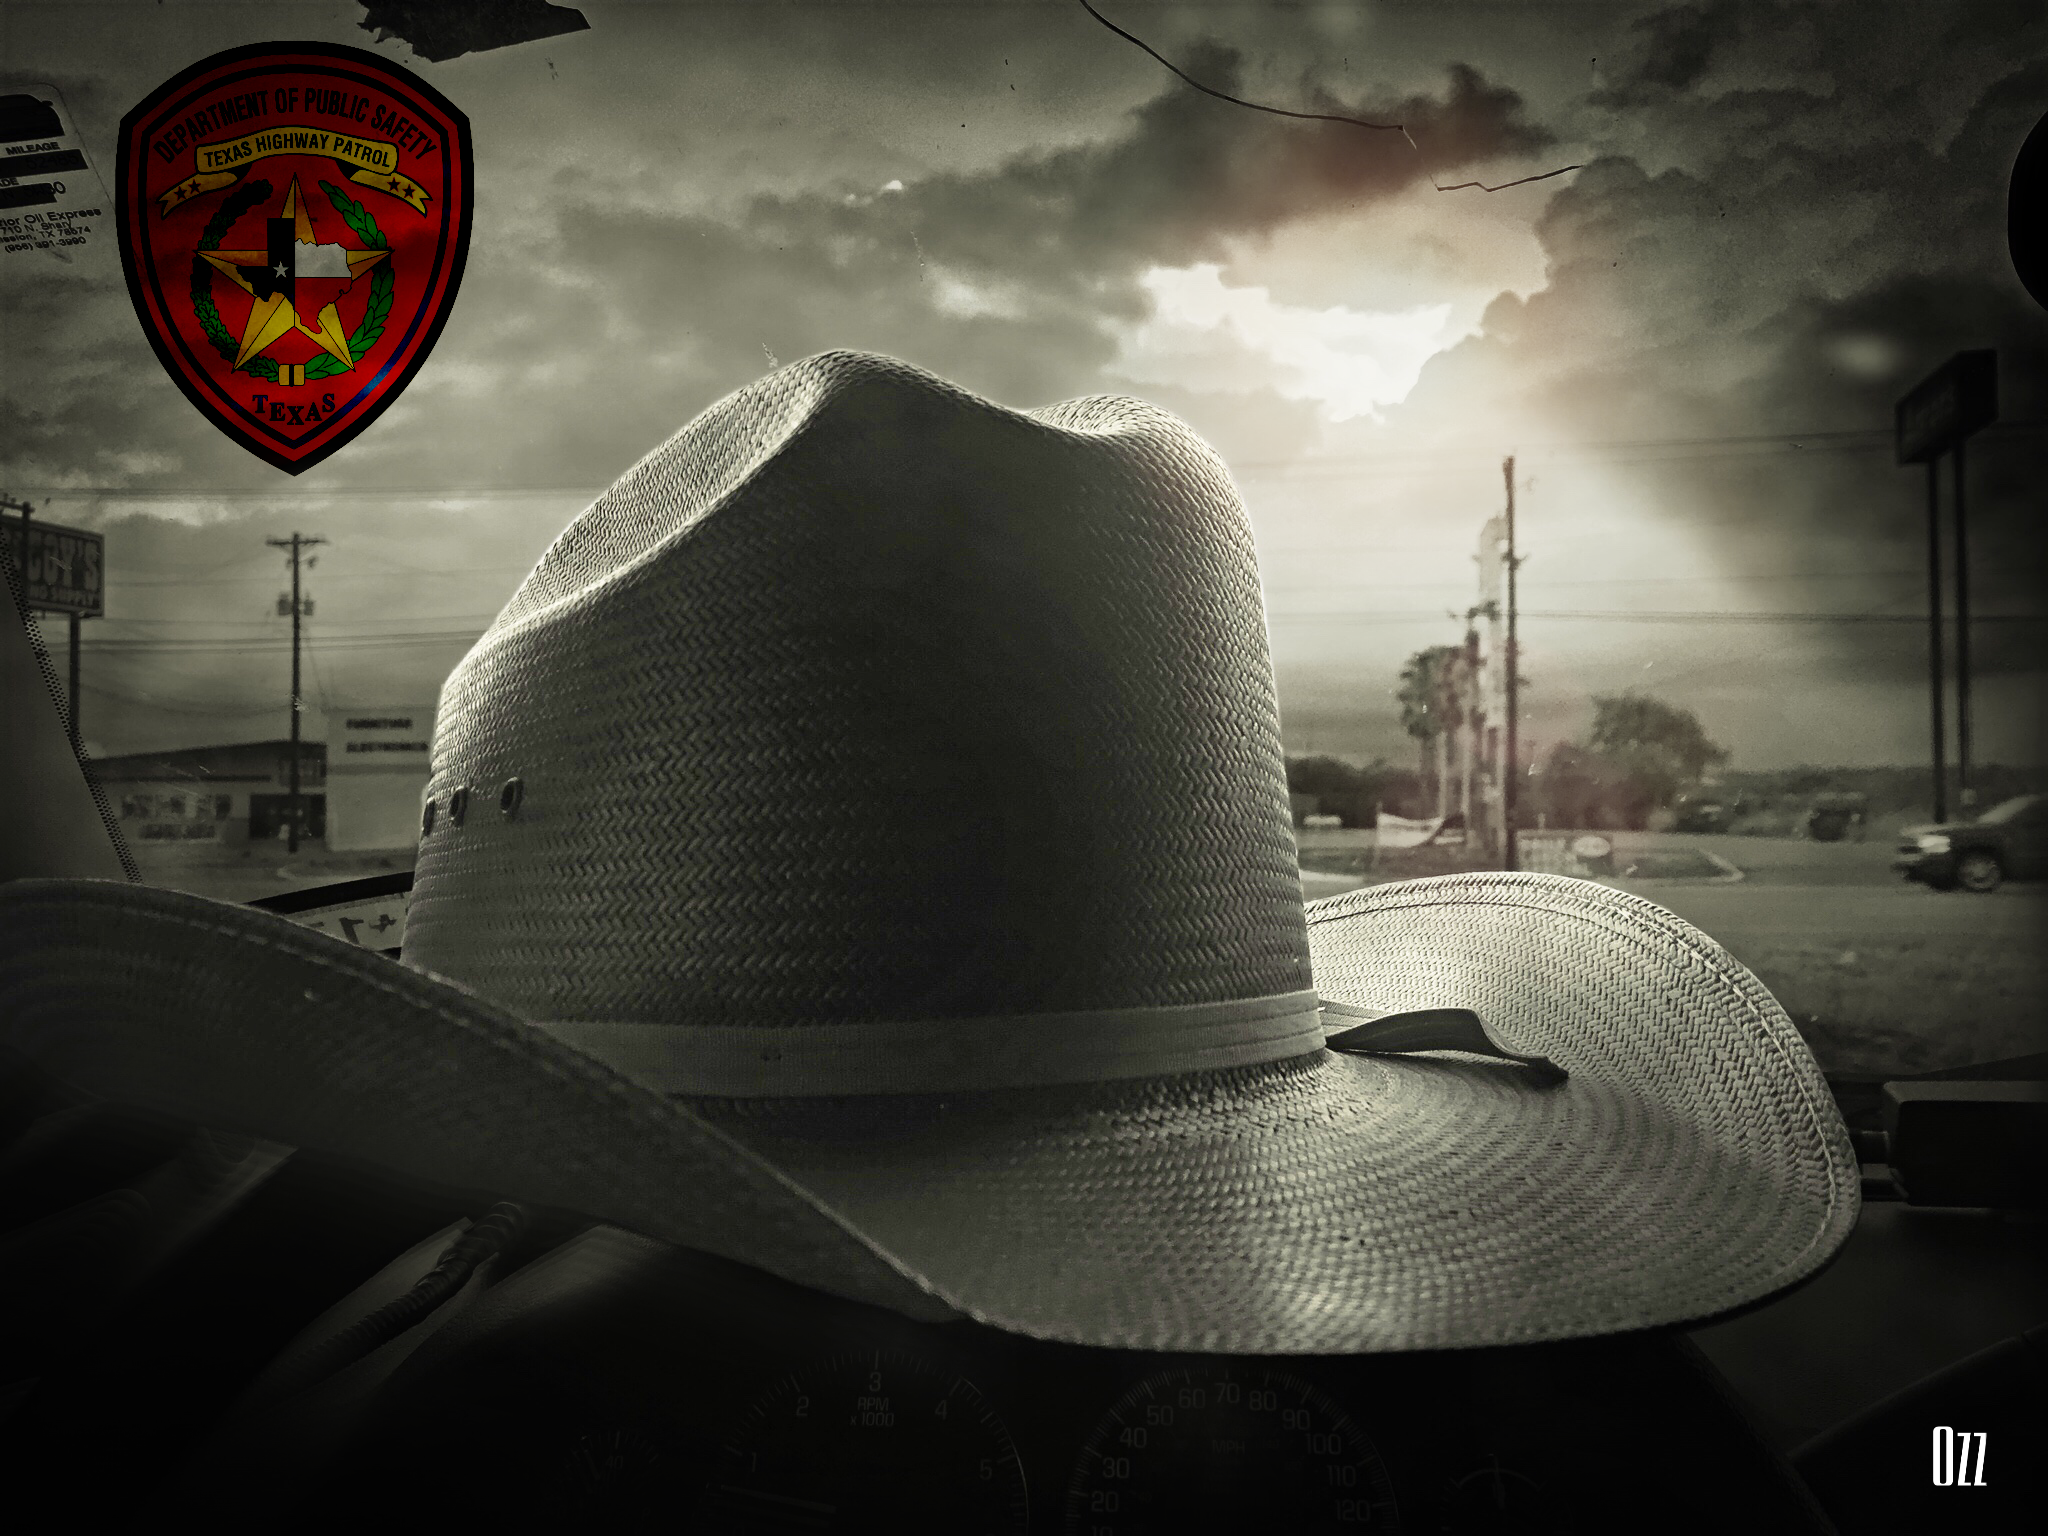 Idea by Osvaldo Guajardo on Texas Highway Patrol Texas